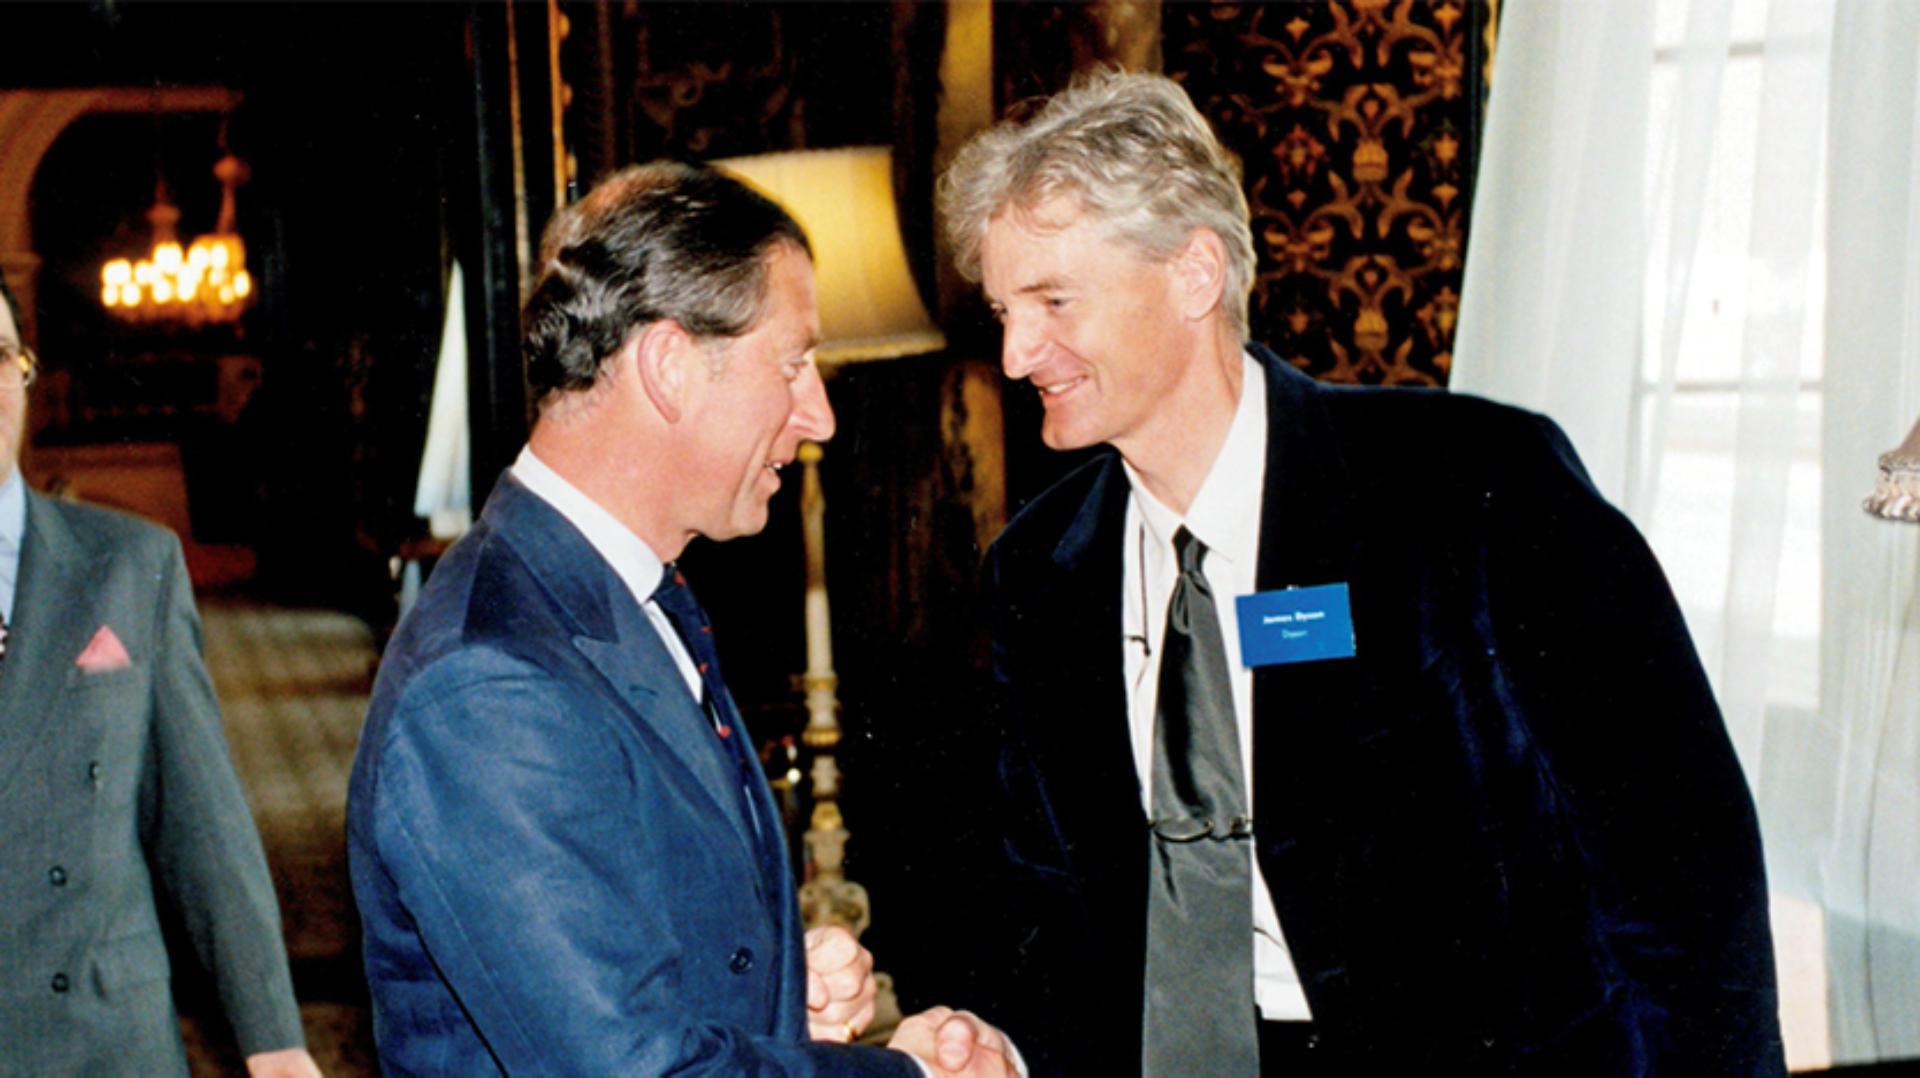 James Dyson meeting HRH Prince Charles